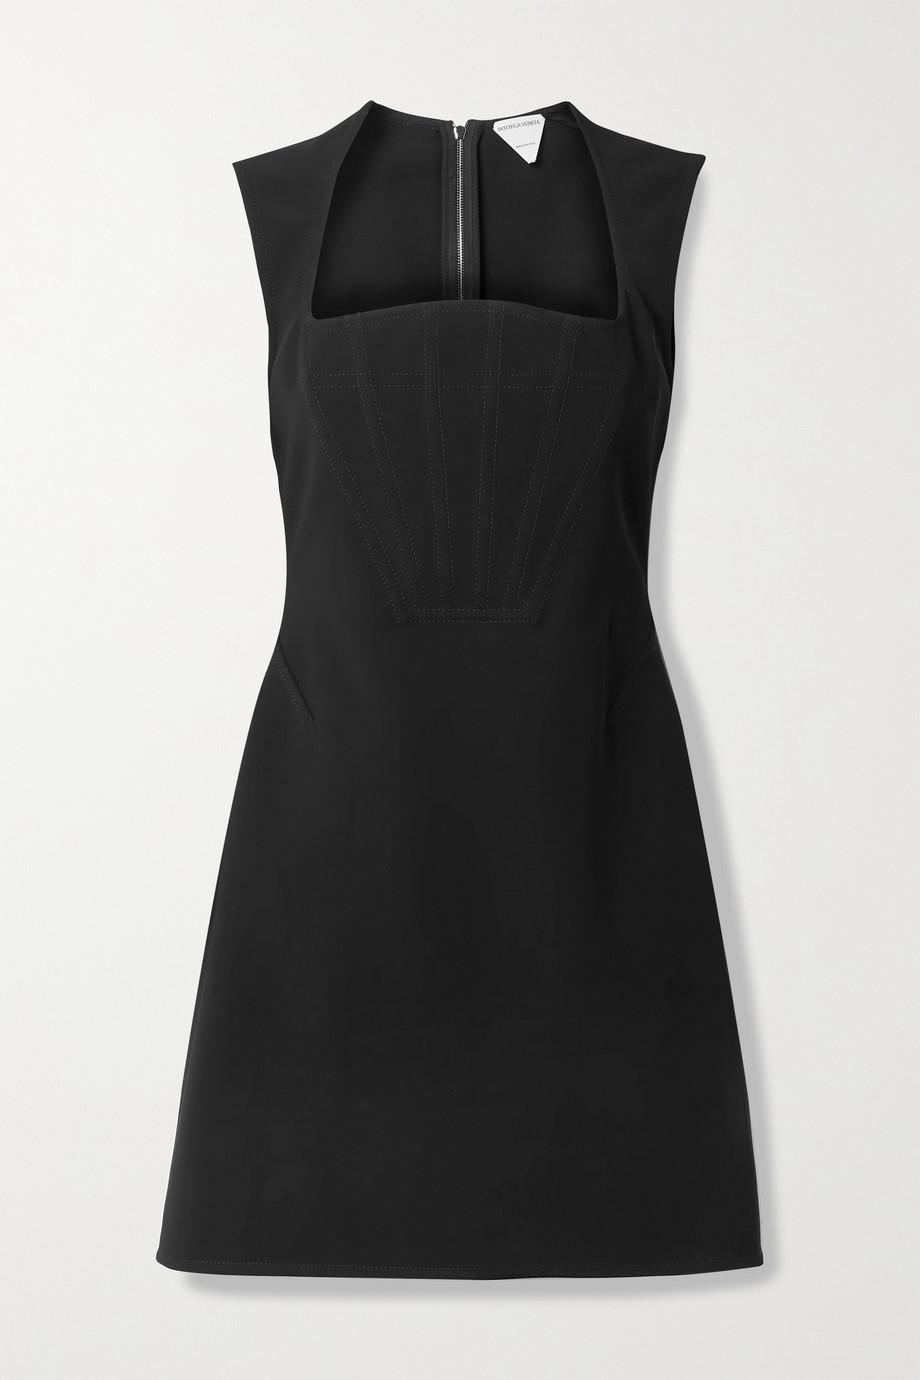 Bottega Veneta Cady mini dress